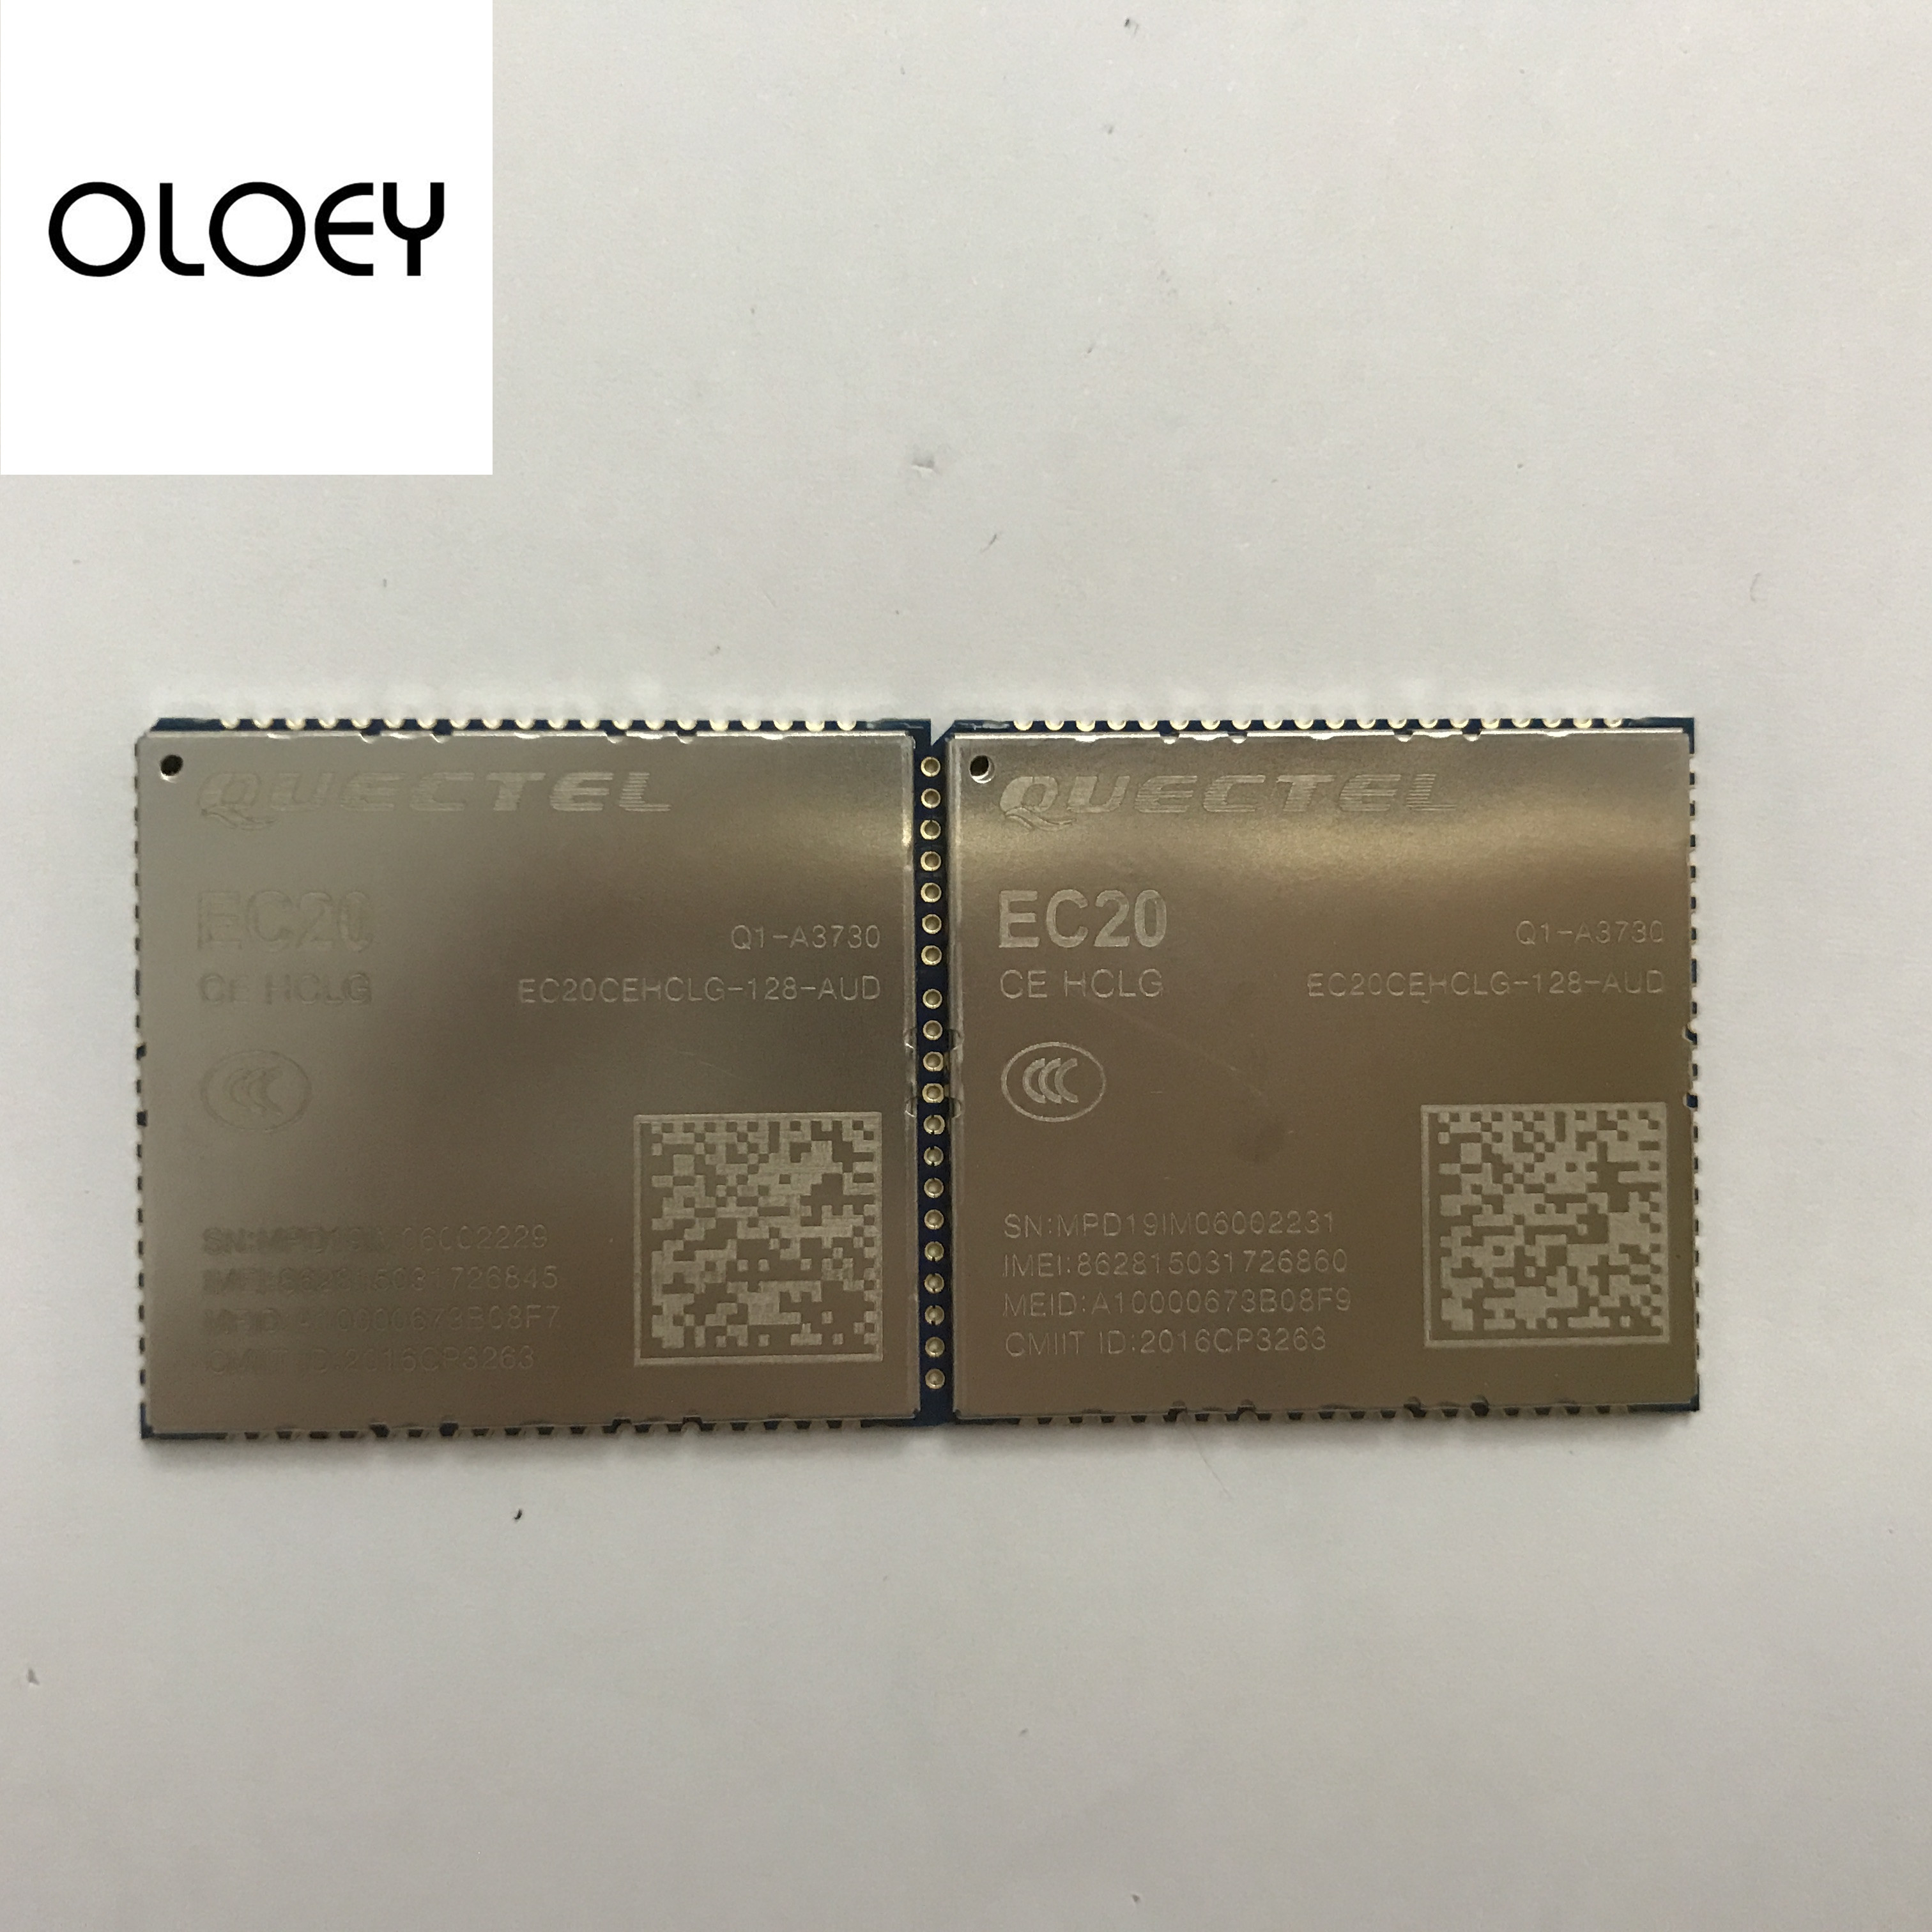 EC20 EC20CEHCLG-128-AUD LCC LTE MODULE Interface,100% Brand New Original